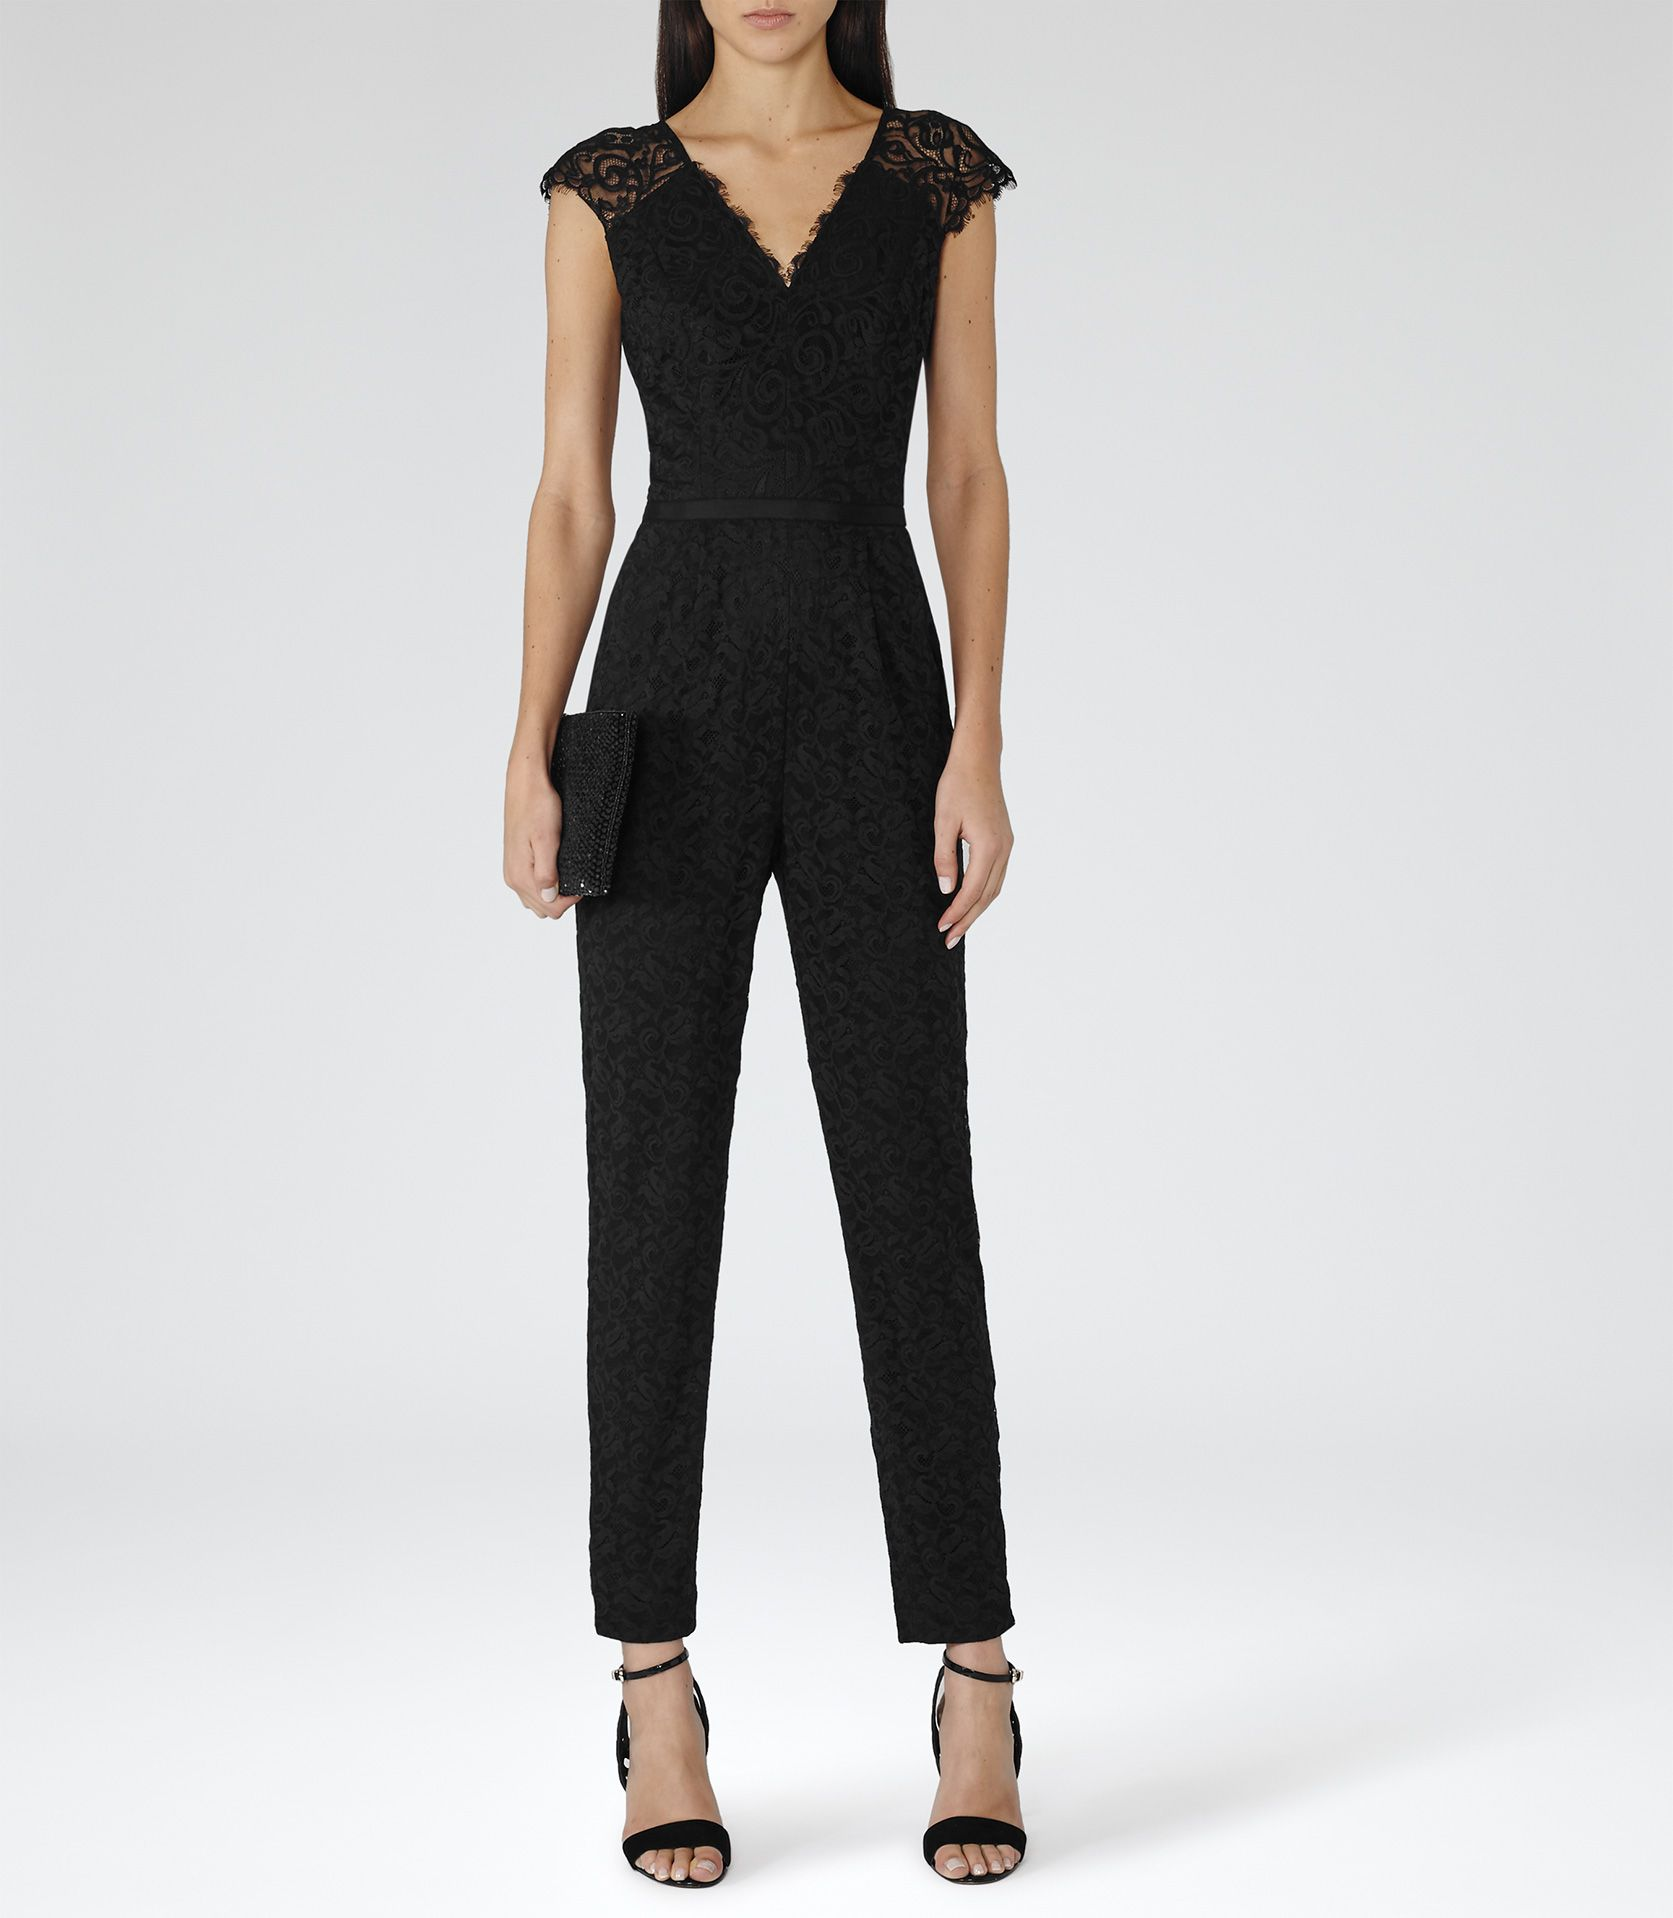 f877ca4206 Womens Black Lace Jumpsuit - Reiss Manola